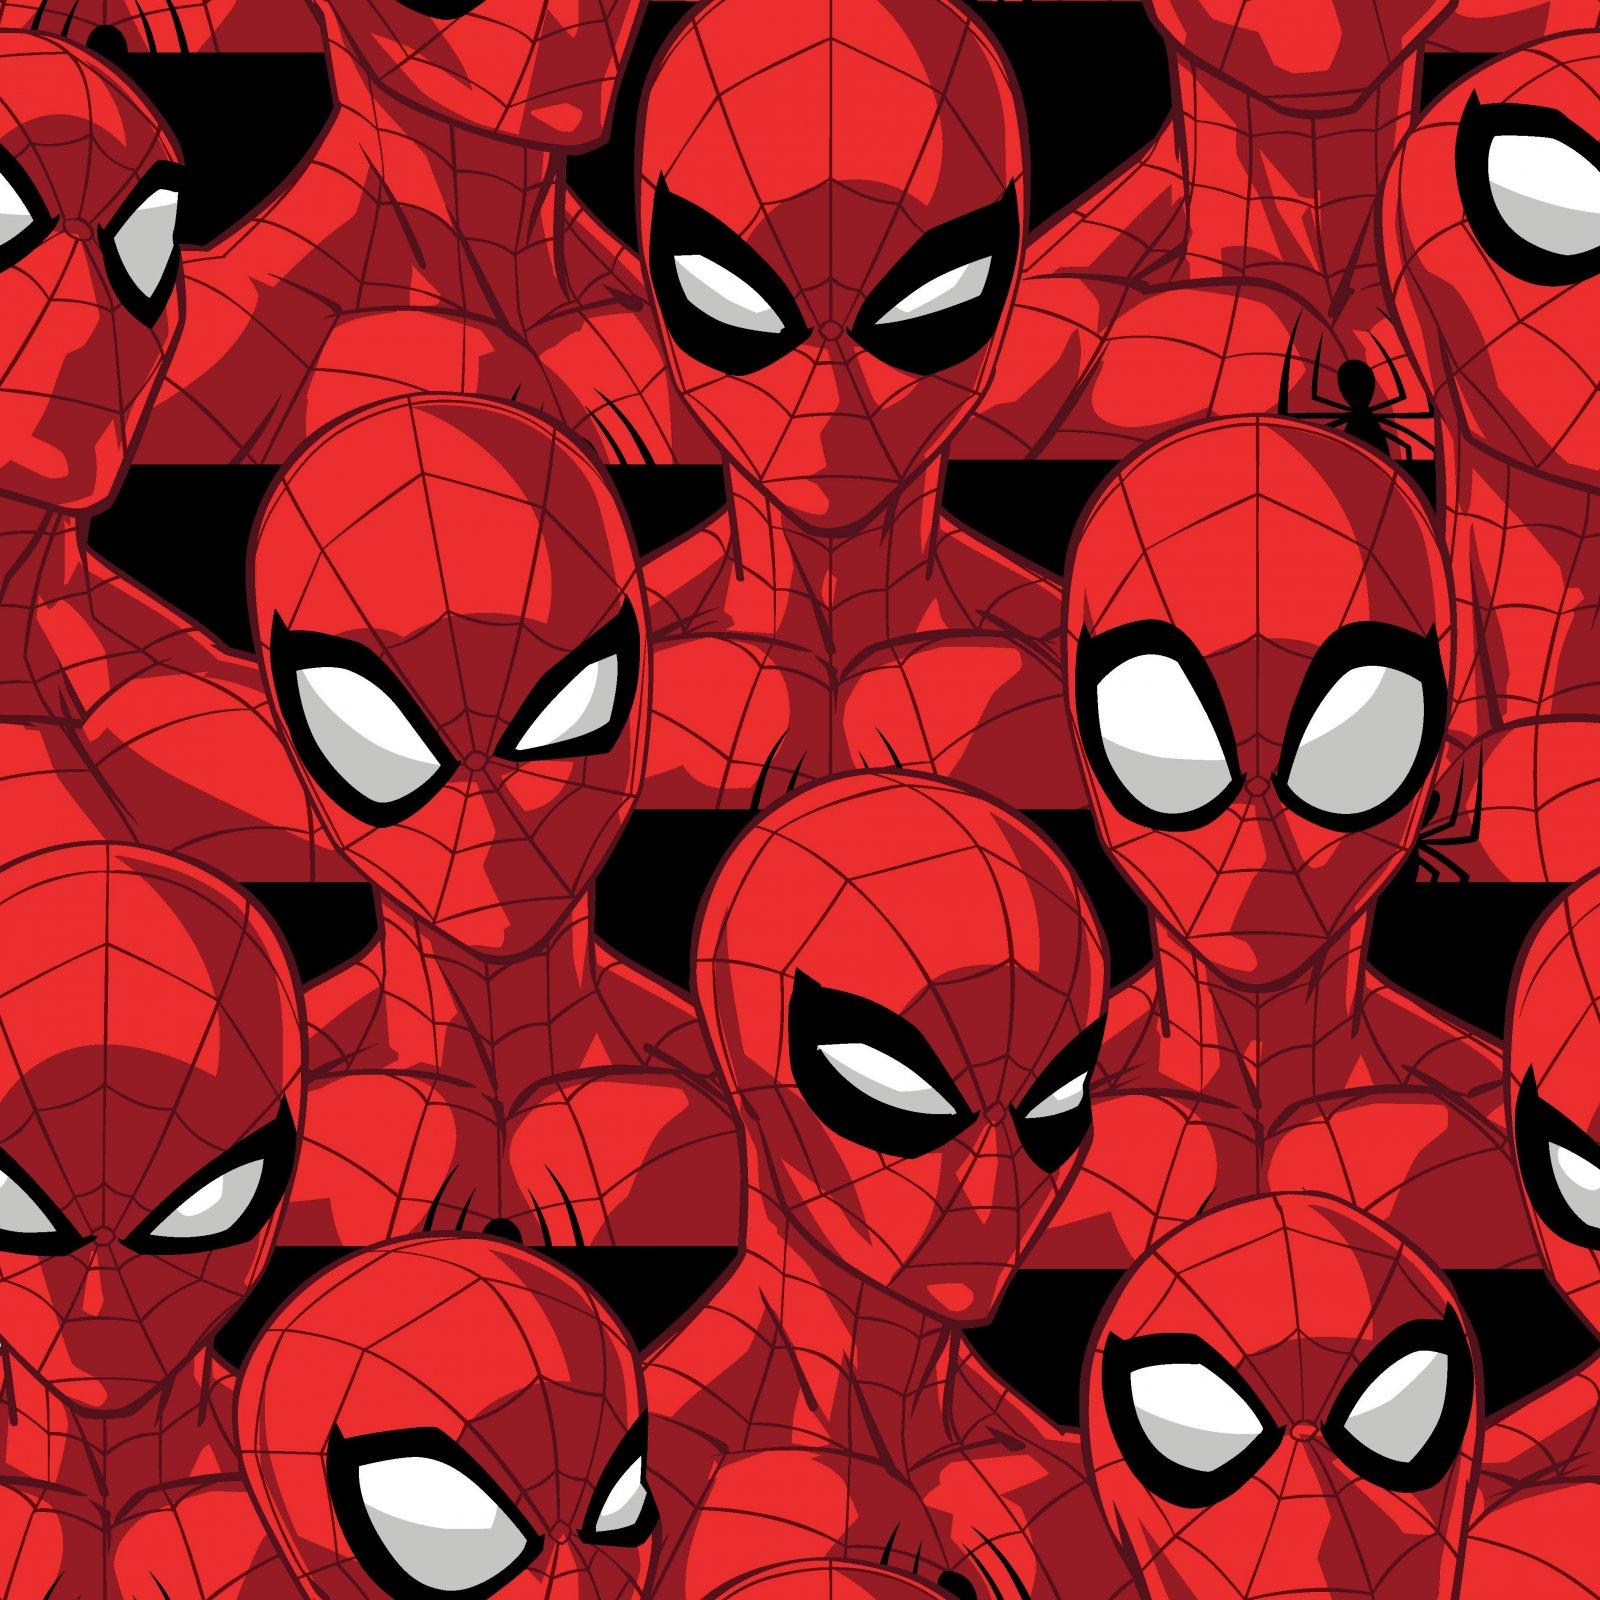 SC-Marvel Spiderman Fleece 73253-A620710 Marvel Spiderman Spider Sense